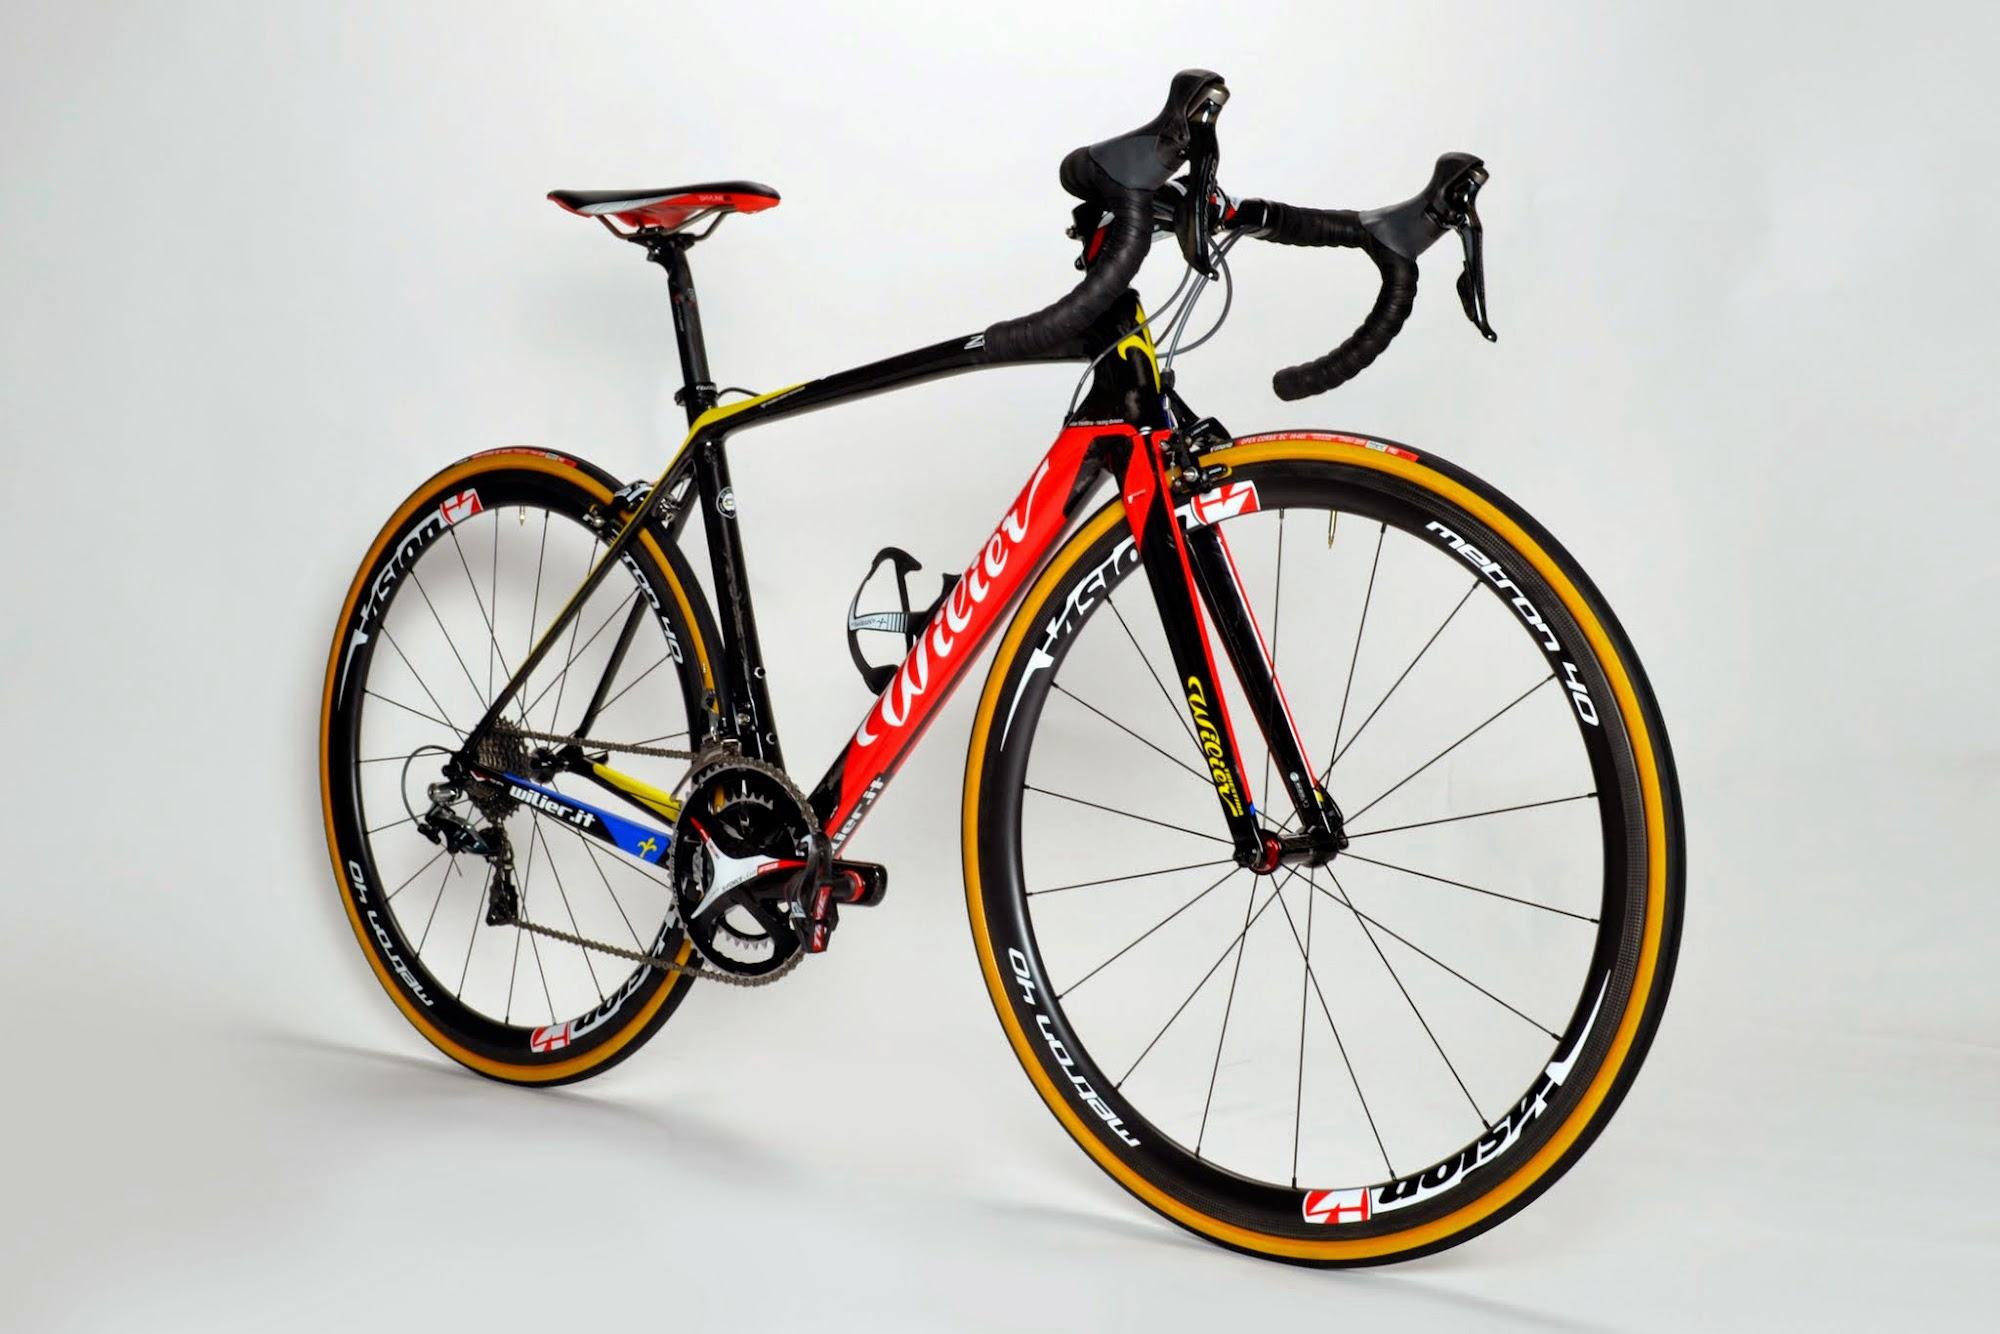 www.twohubs.com: 2015 Team Colombia Wilier Triestina Zero.7 Complete Bike at twohubs.com